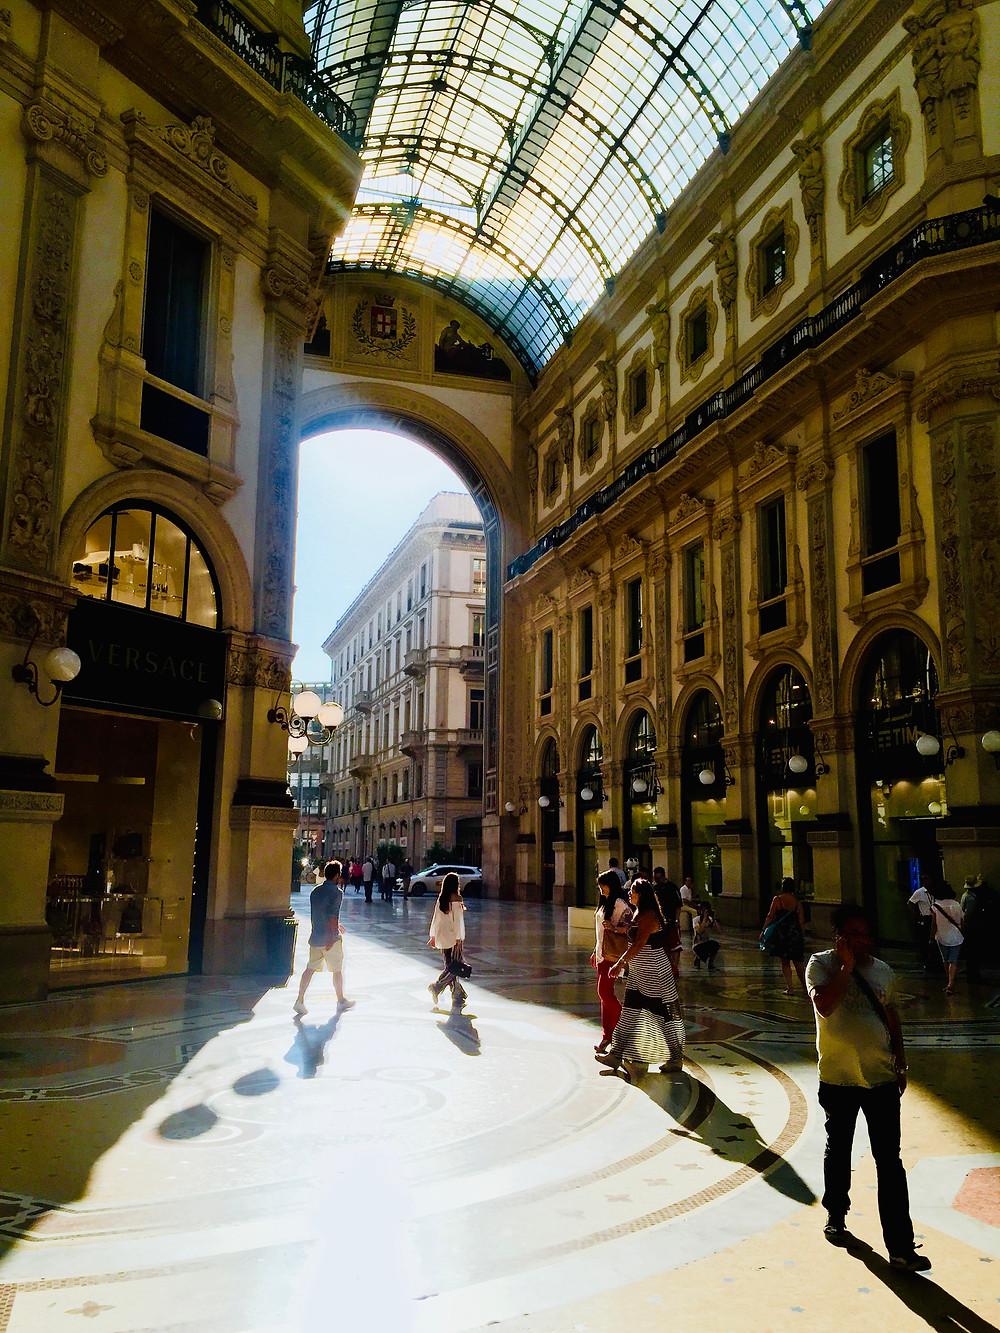 People walking under the glass tiled roof of Galleria Vittorio Emanuele II